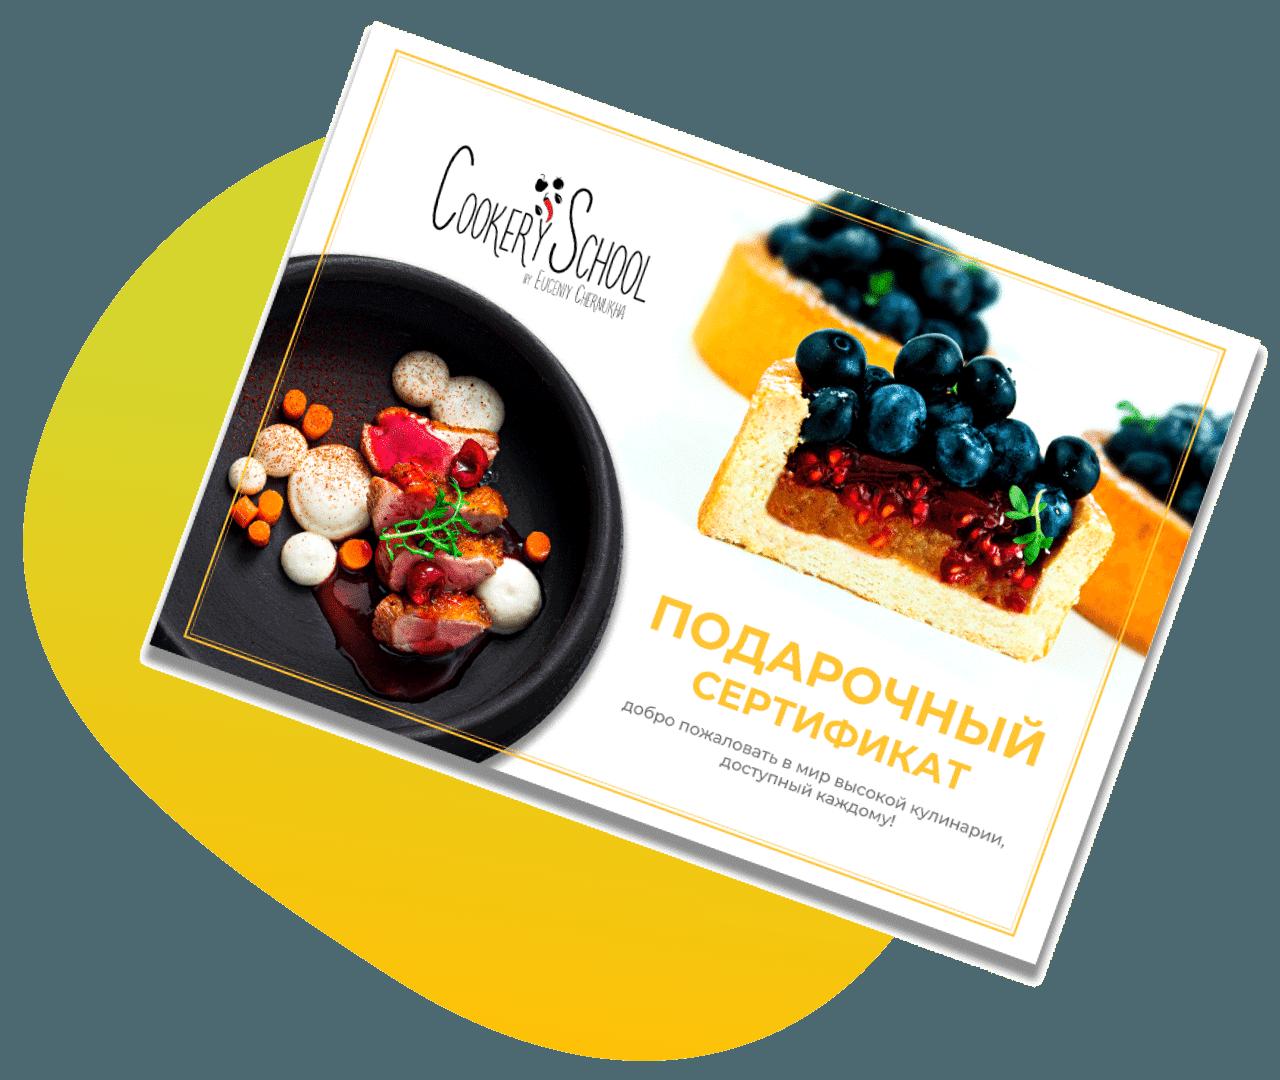 Новогодние корпоративы 2021 dizajn beddz nazvaniya Fun Kitchen